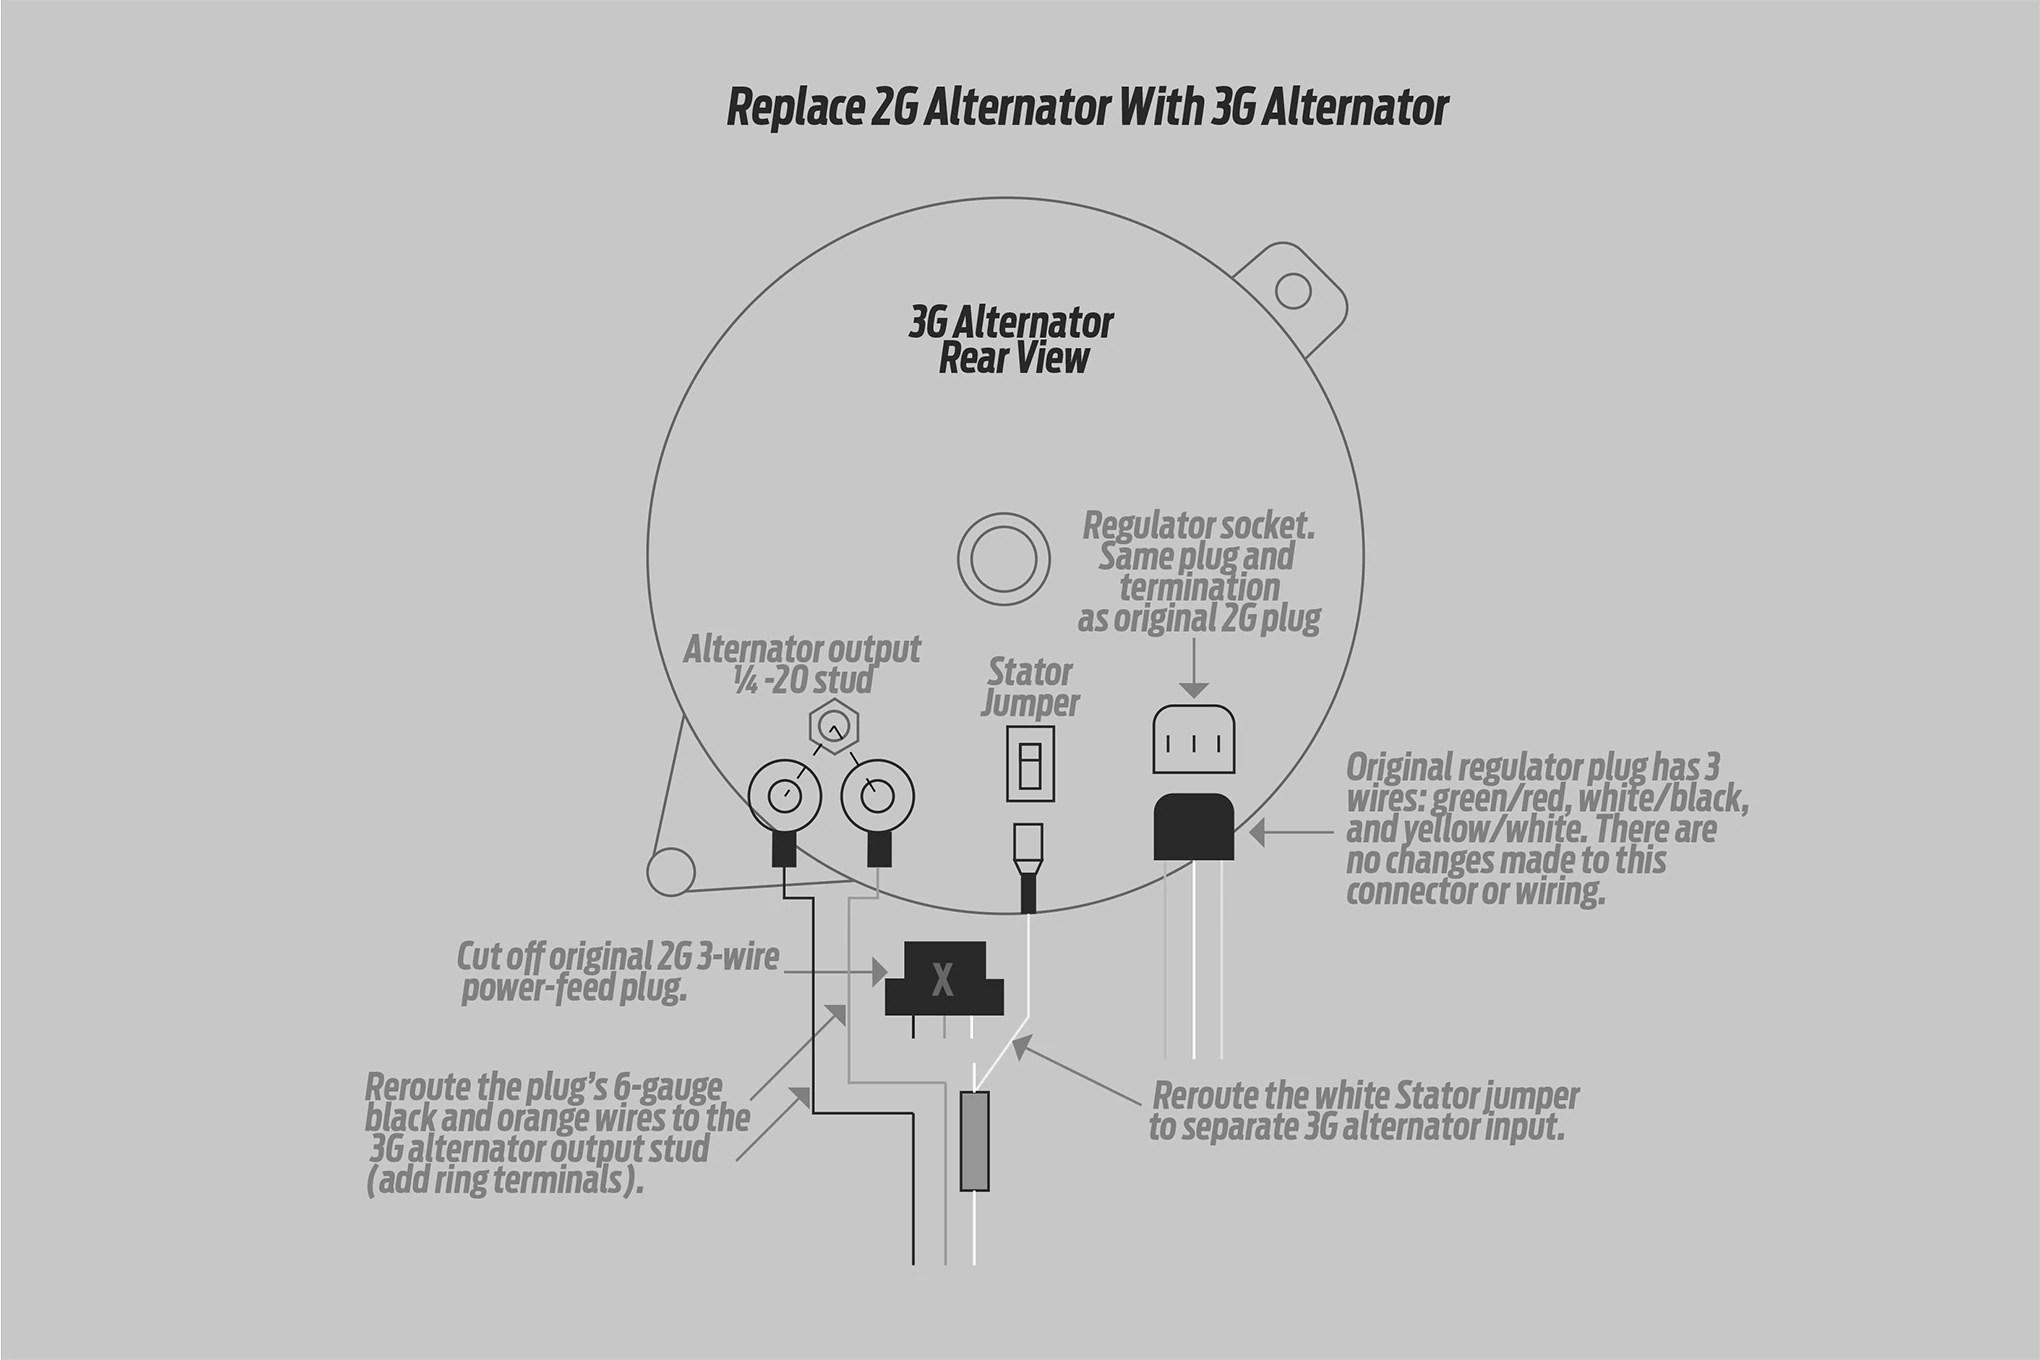 from ffi rjm injection 1g wiring 3g wiring after conversion wiring 3g alternator to battery wiring diagram [ 2040 x 1360 Pixel ]